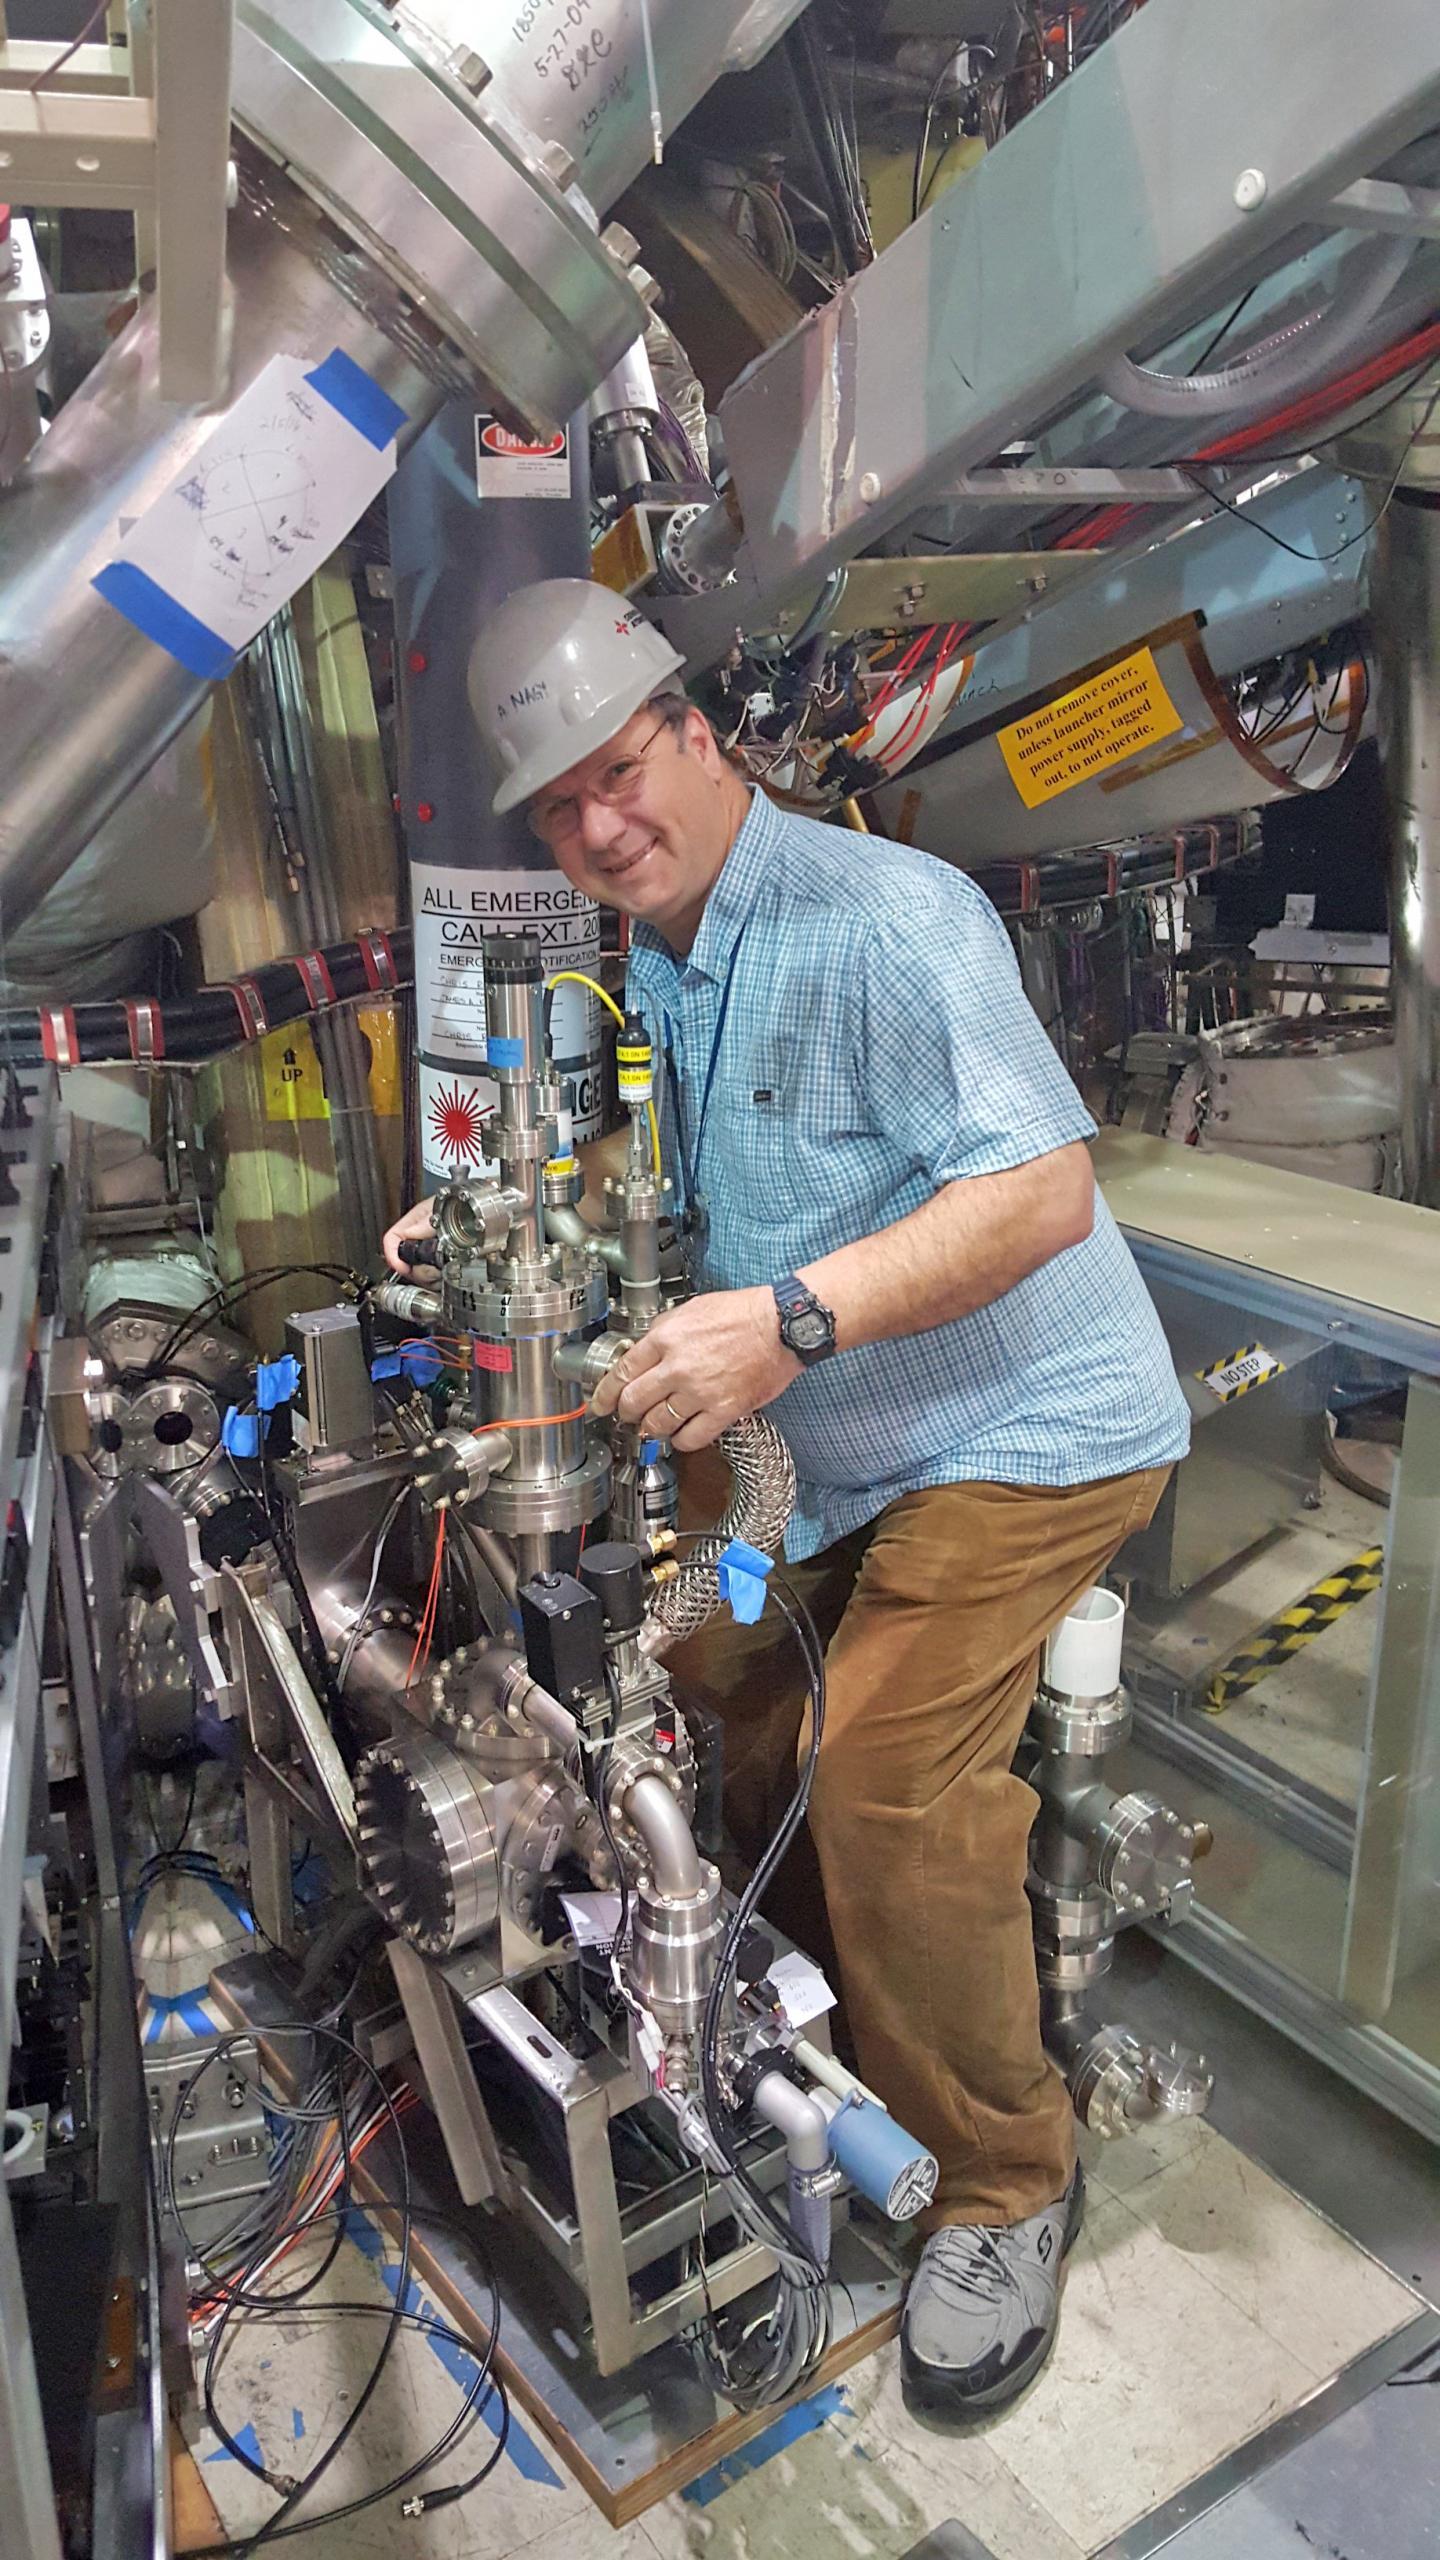 Alex Nagy, DOE/Princeton Plasma Physics Laboratory